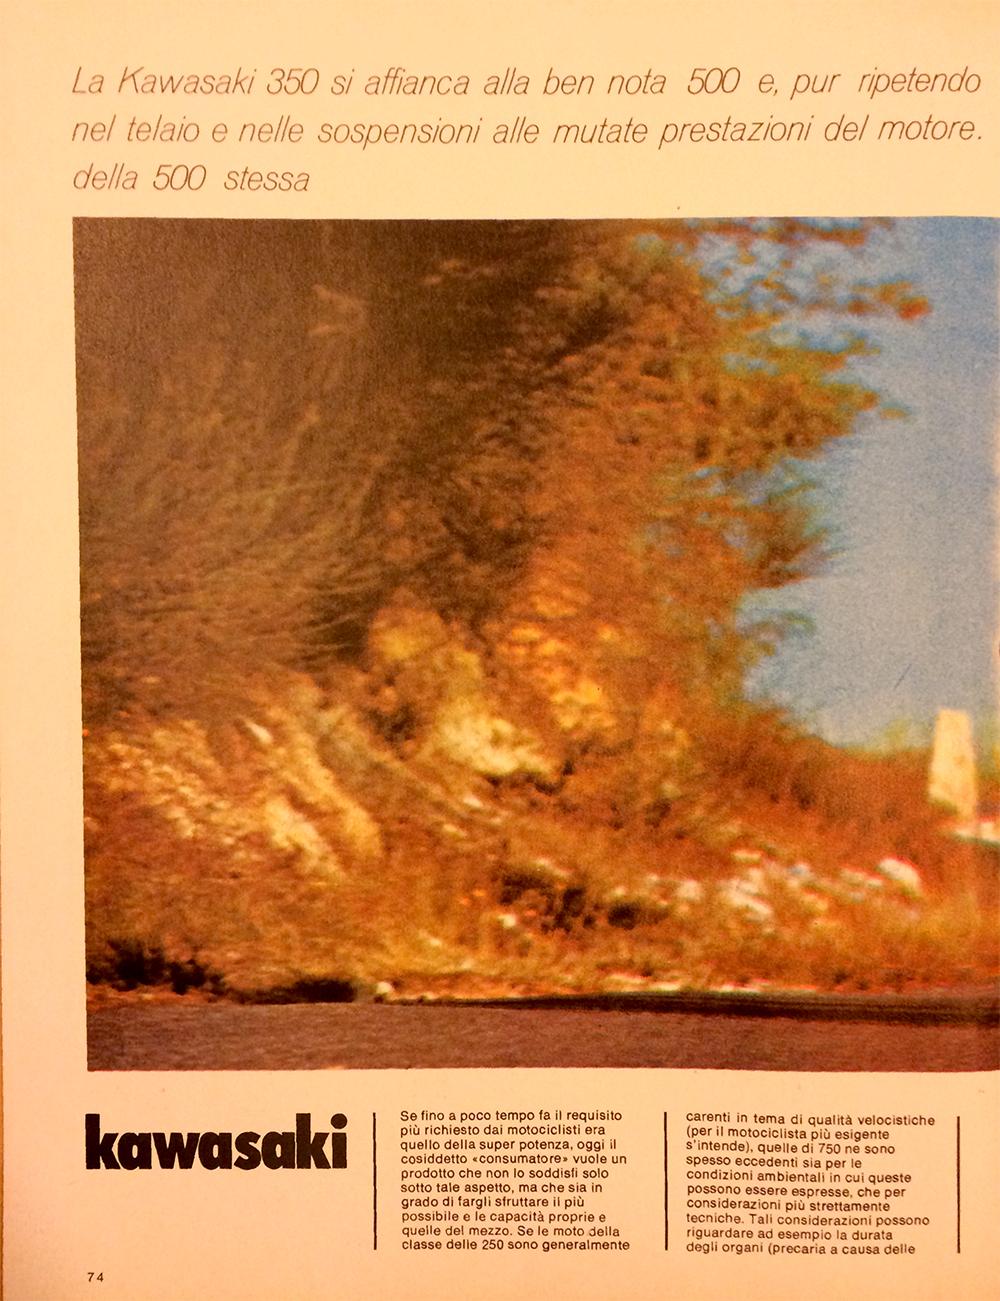 1971 Kawasaki 350 S2 Italy road test 02.jpg